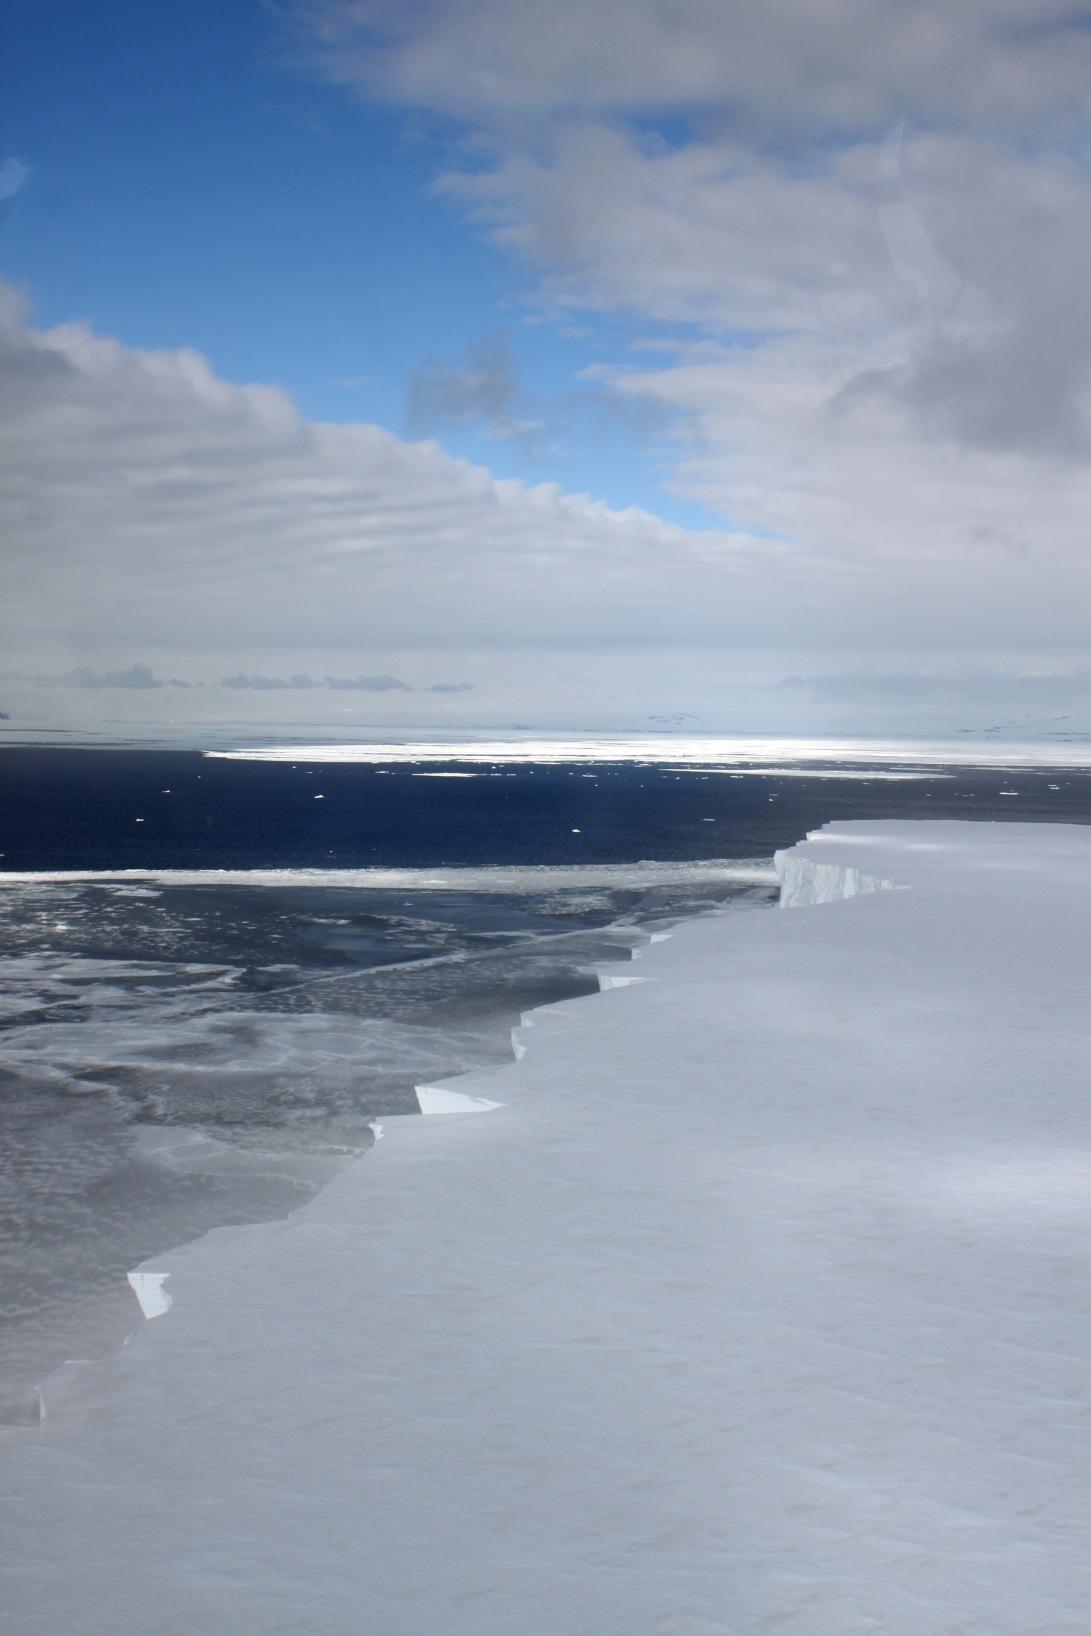 helo 4 mile iceberg.jpg